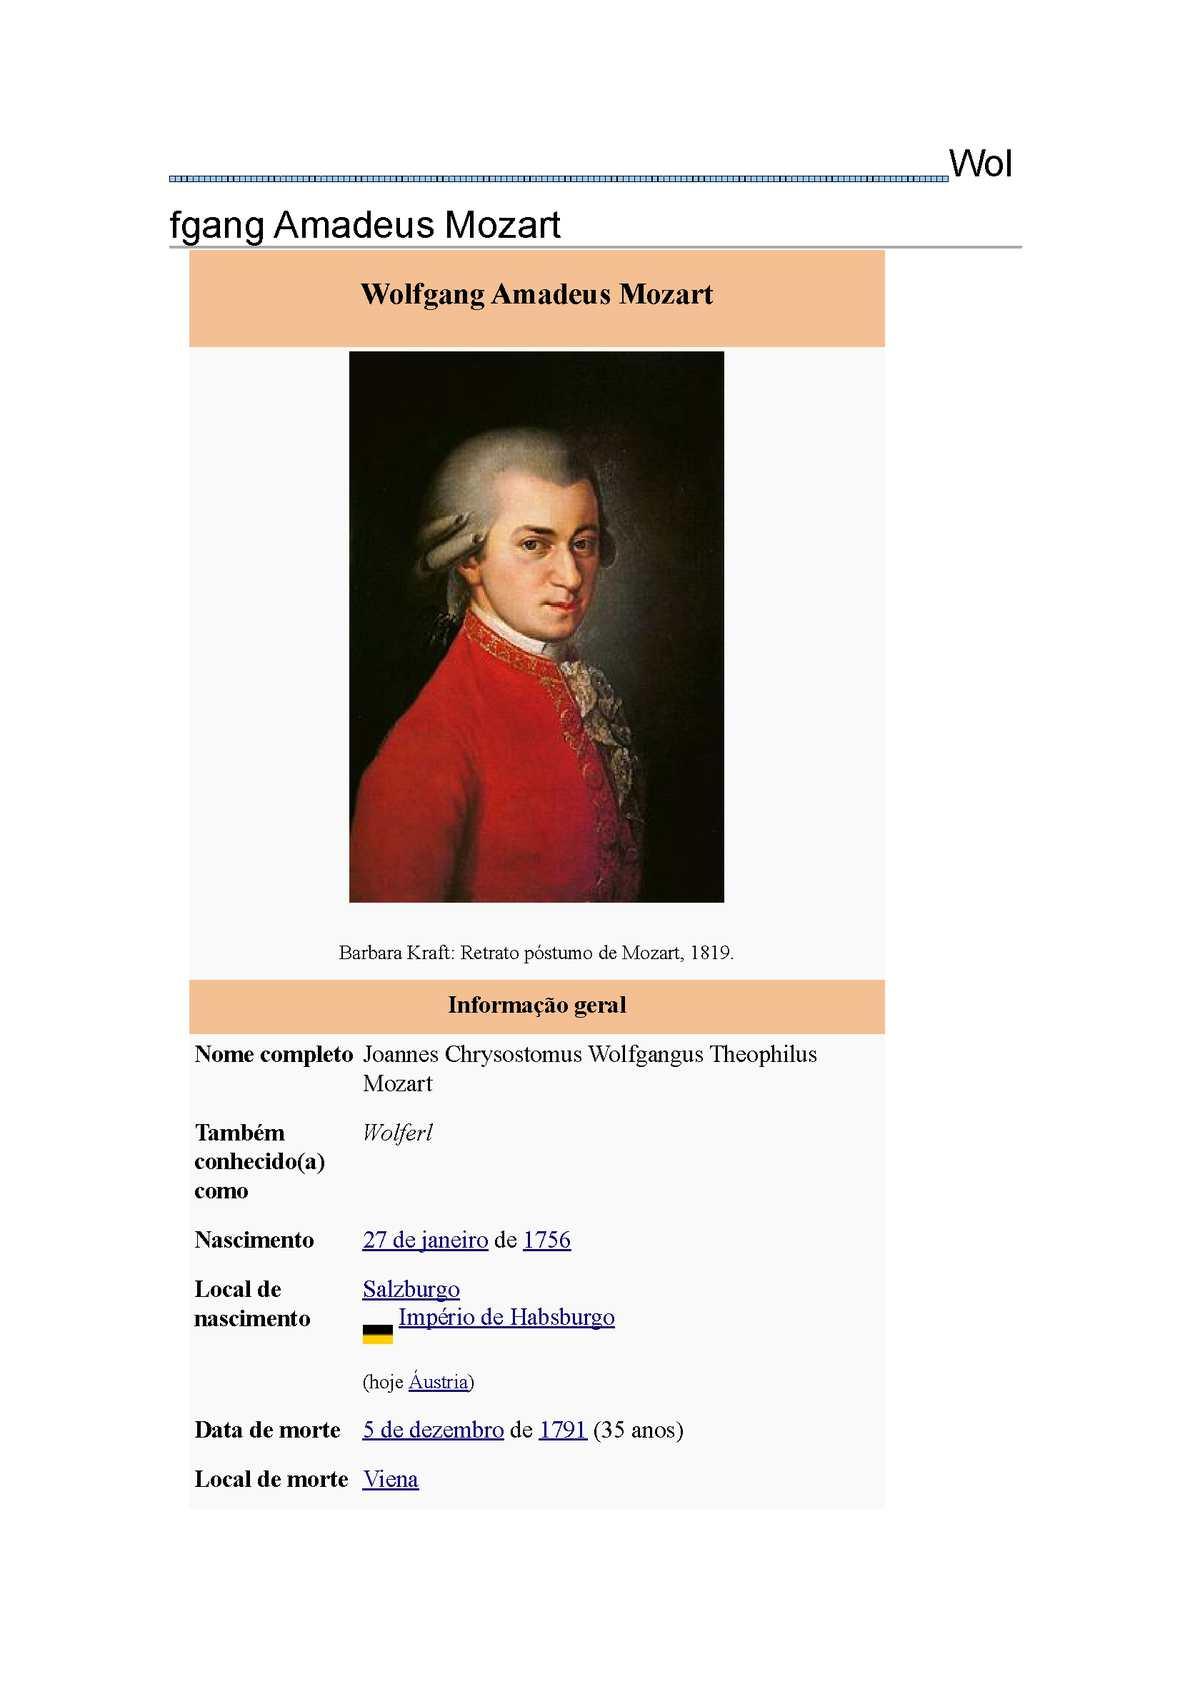 Calaméo - um pouco de Wolfgang Amadeus Mozart, um pouco de Ludwig van  Beethoven e um pouco de MythBusters